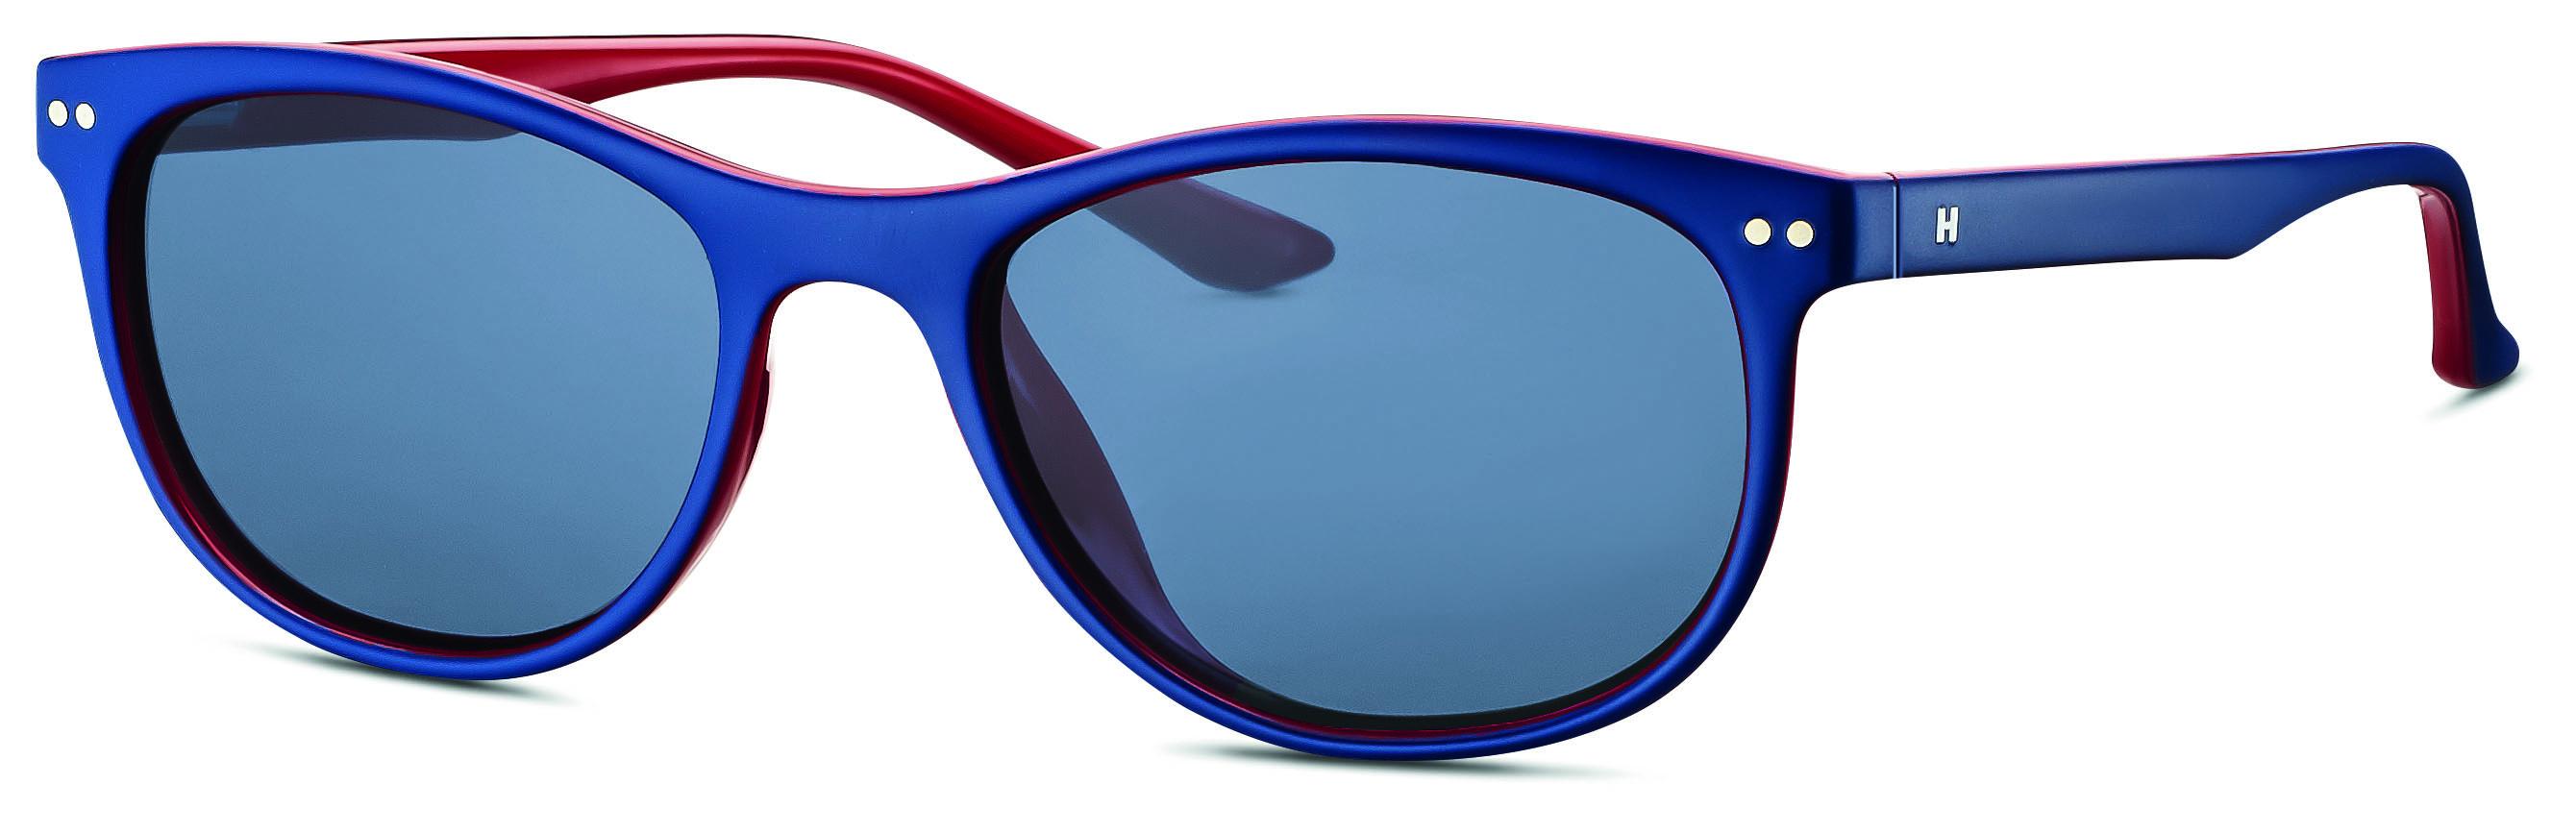 Humphrey's Kindersonnenbrille 585201-Blau-Rot 5eFJqDU